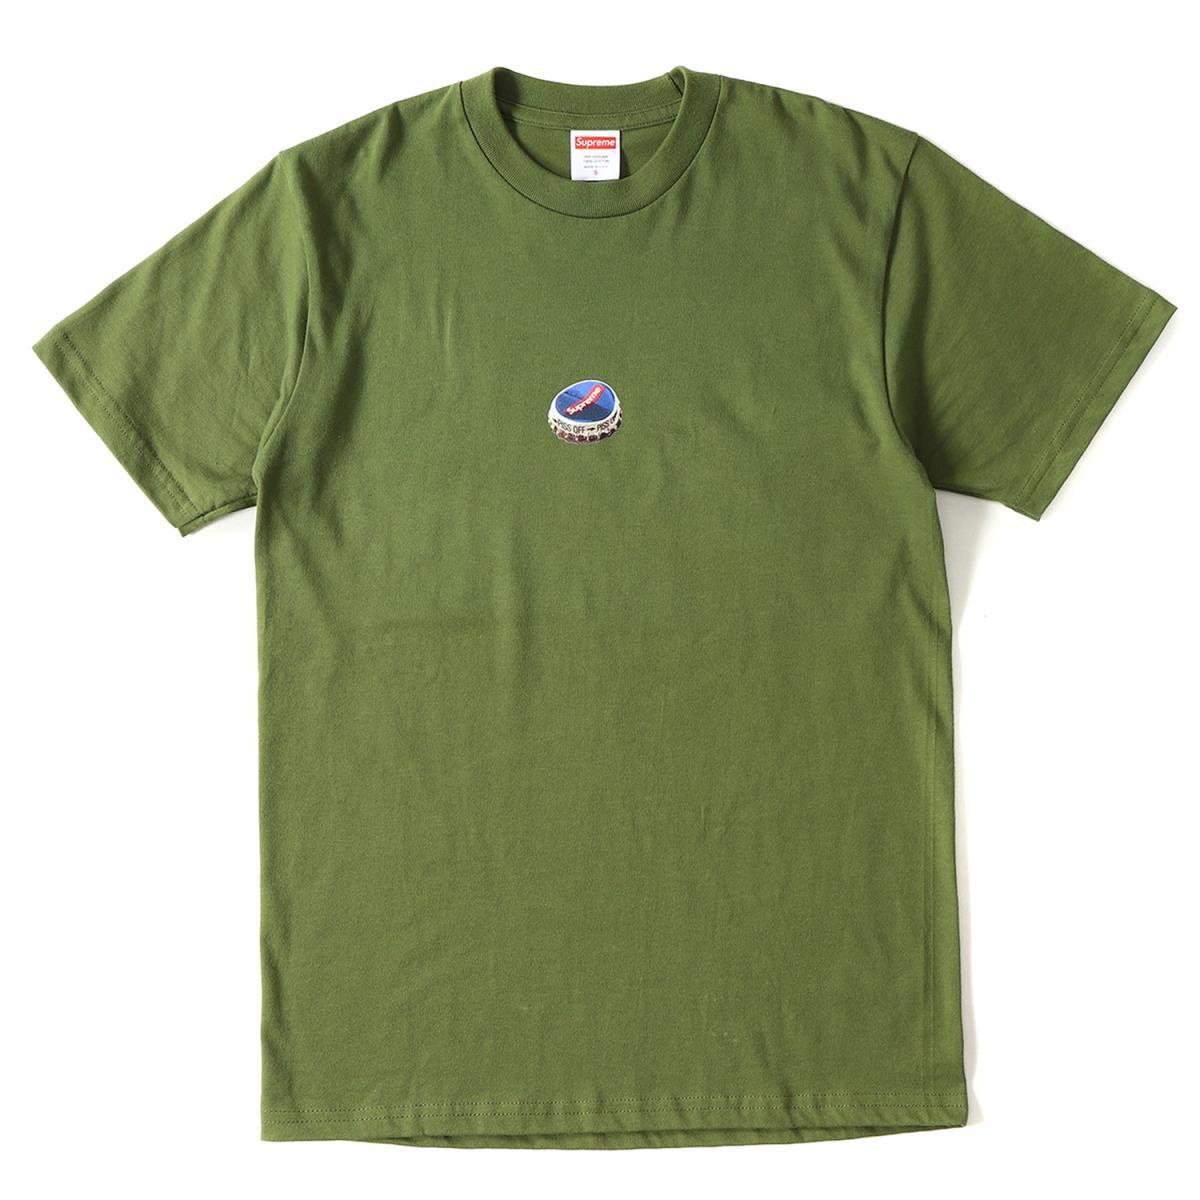 Supreme (シュプリーム) 18A/W ボトルキャップロゴTシャツ(Bottle Cap Tee) オリーブ S 【メンズ】【美品】【K2087】【中古】【あす楽☆対応可】